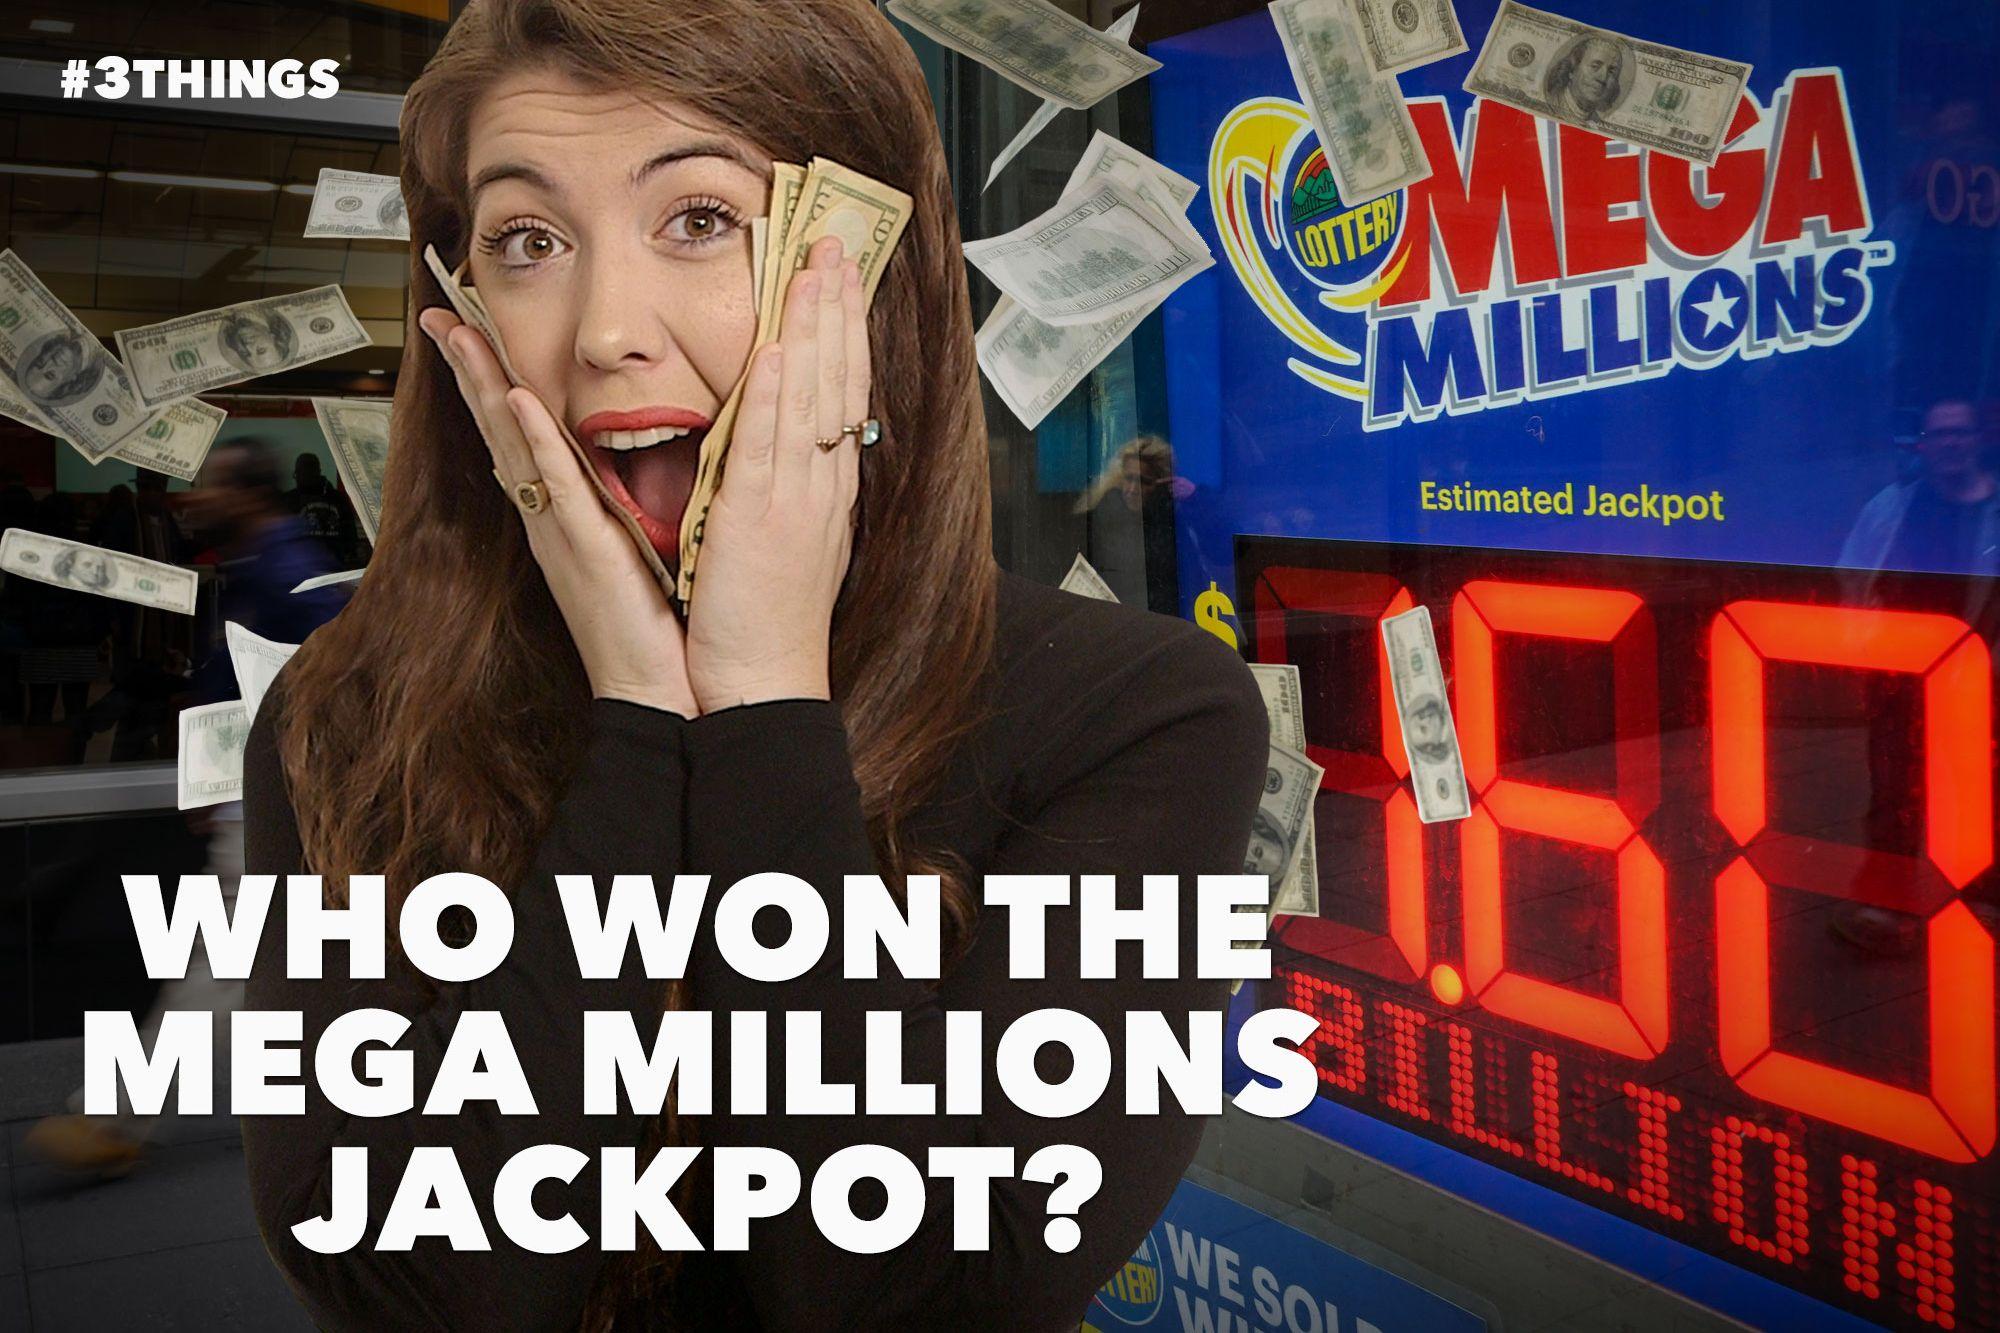 60-Second Video: Who Won the Mega Millions Jackpot?